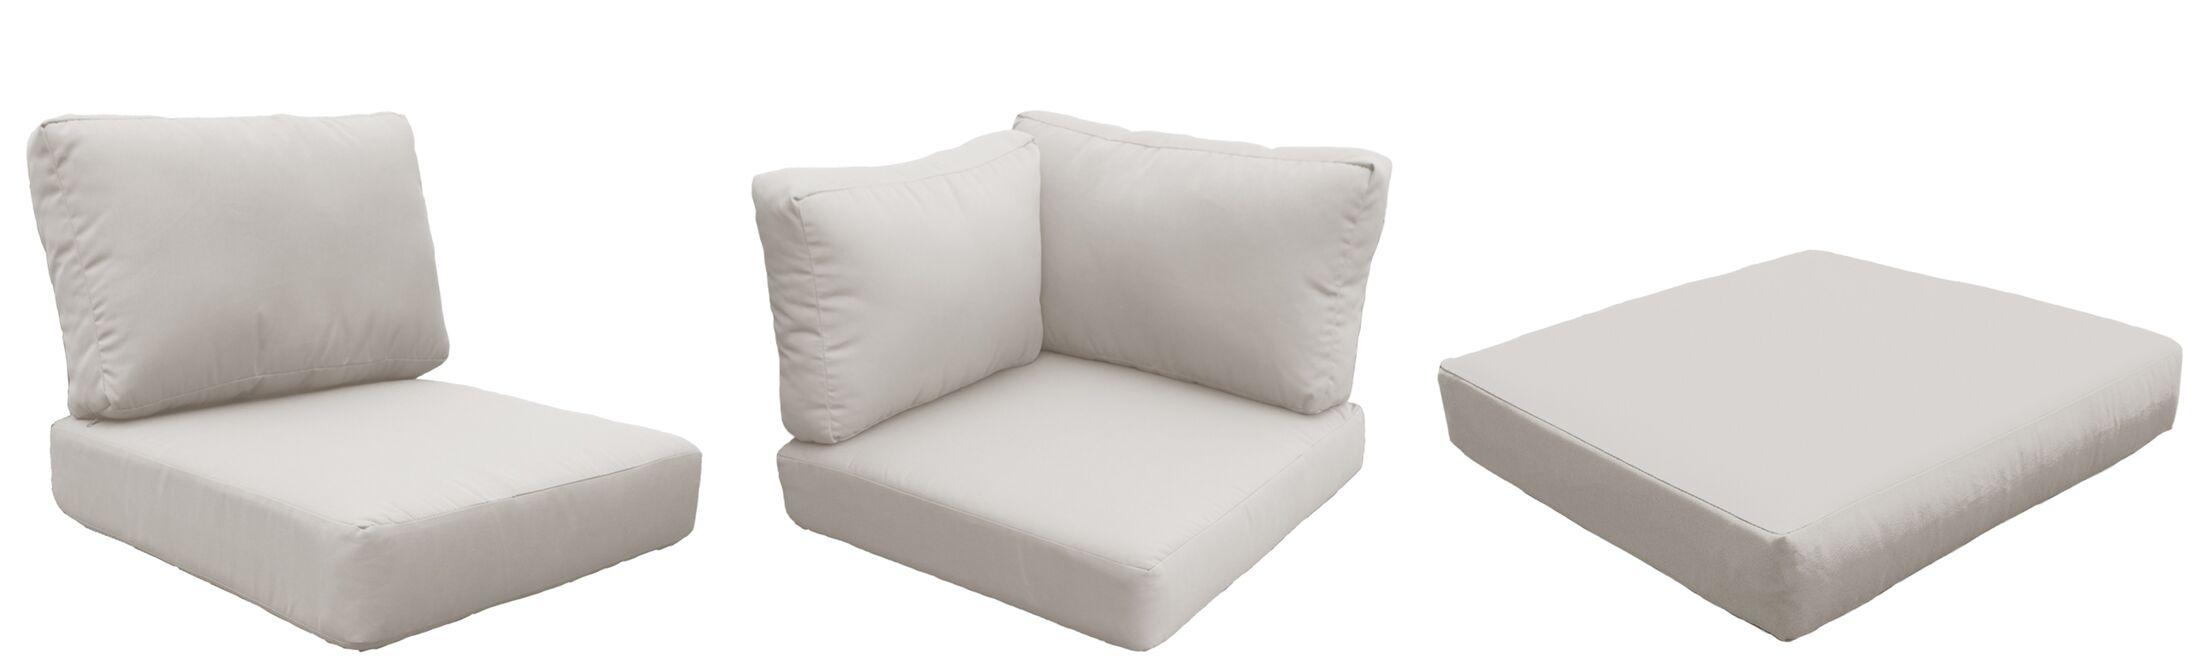 East Village Outdoor 25 Piece Lounge Chair Cushion Set Fabric: Beige